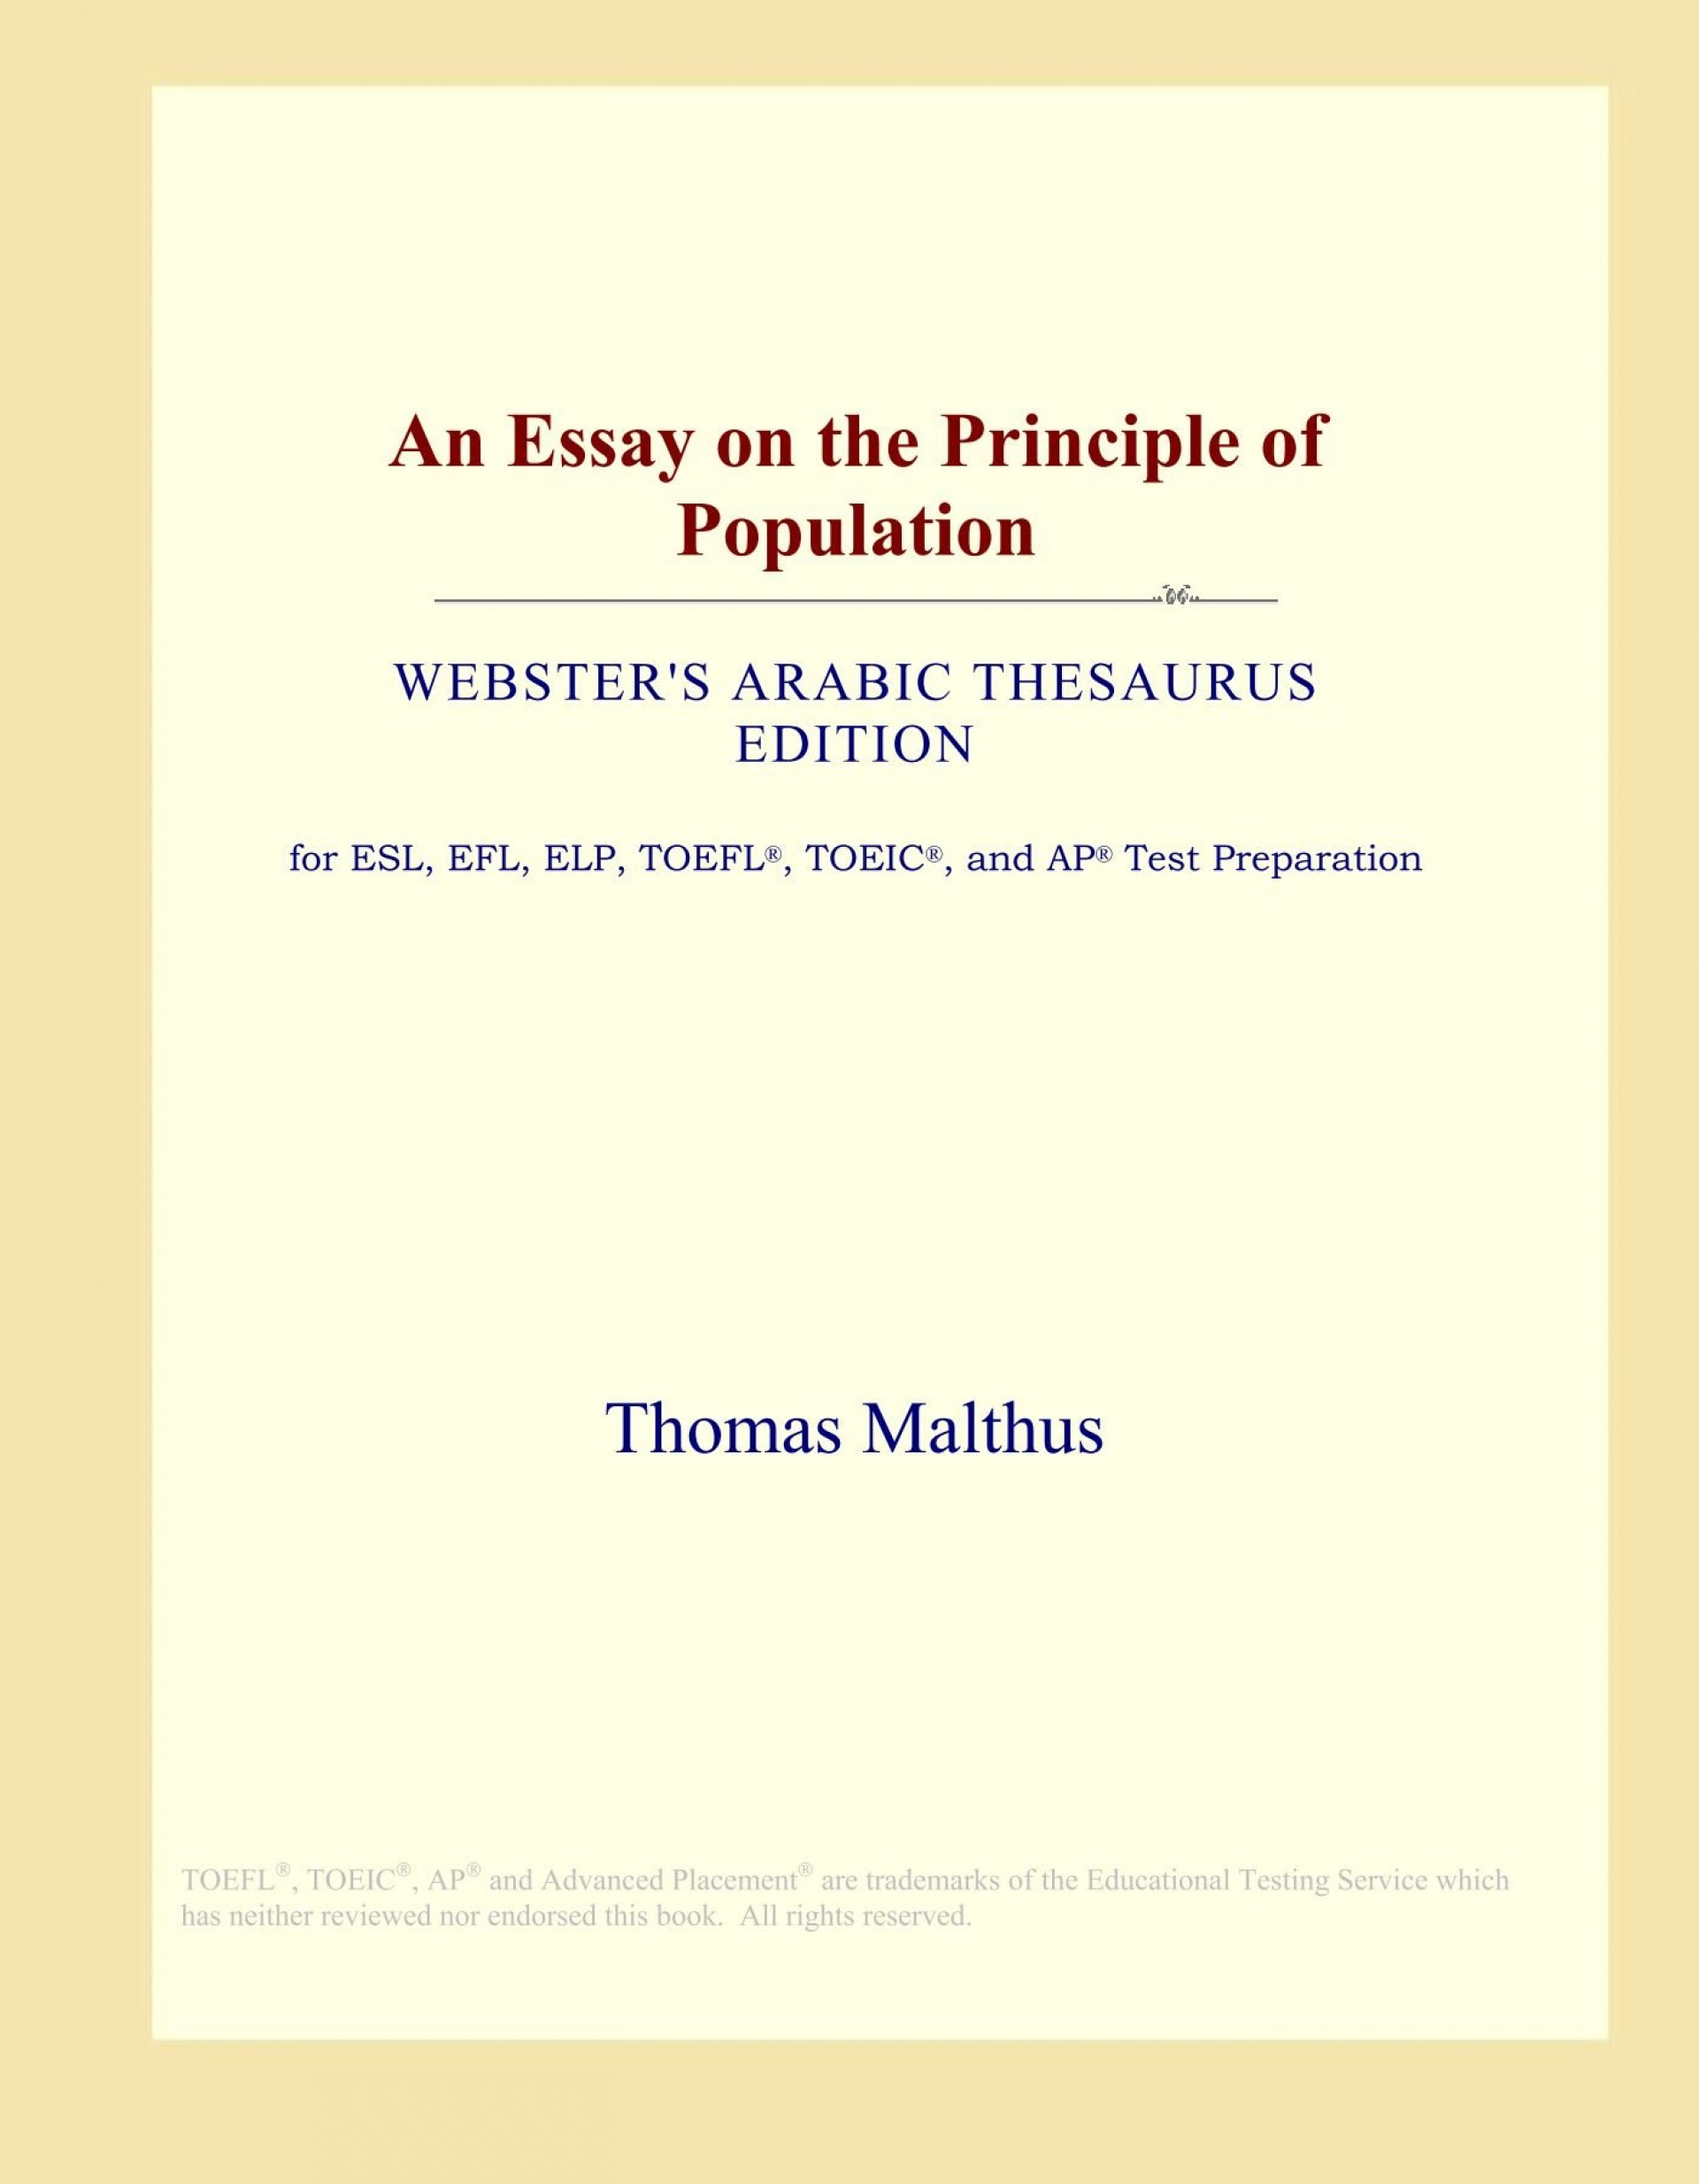 015 61groeunvgl Essay On The Principle Of Population Singular Pdf By Thomas Malthus Main Idea 1920